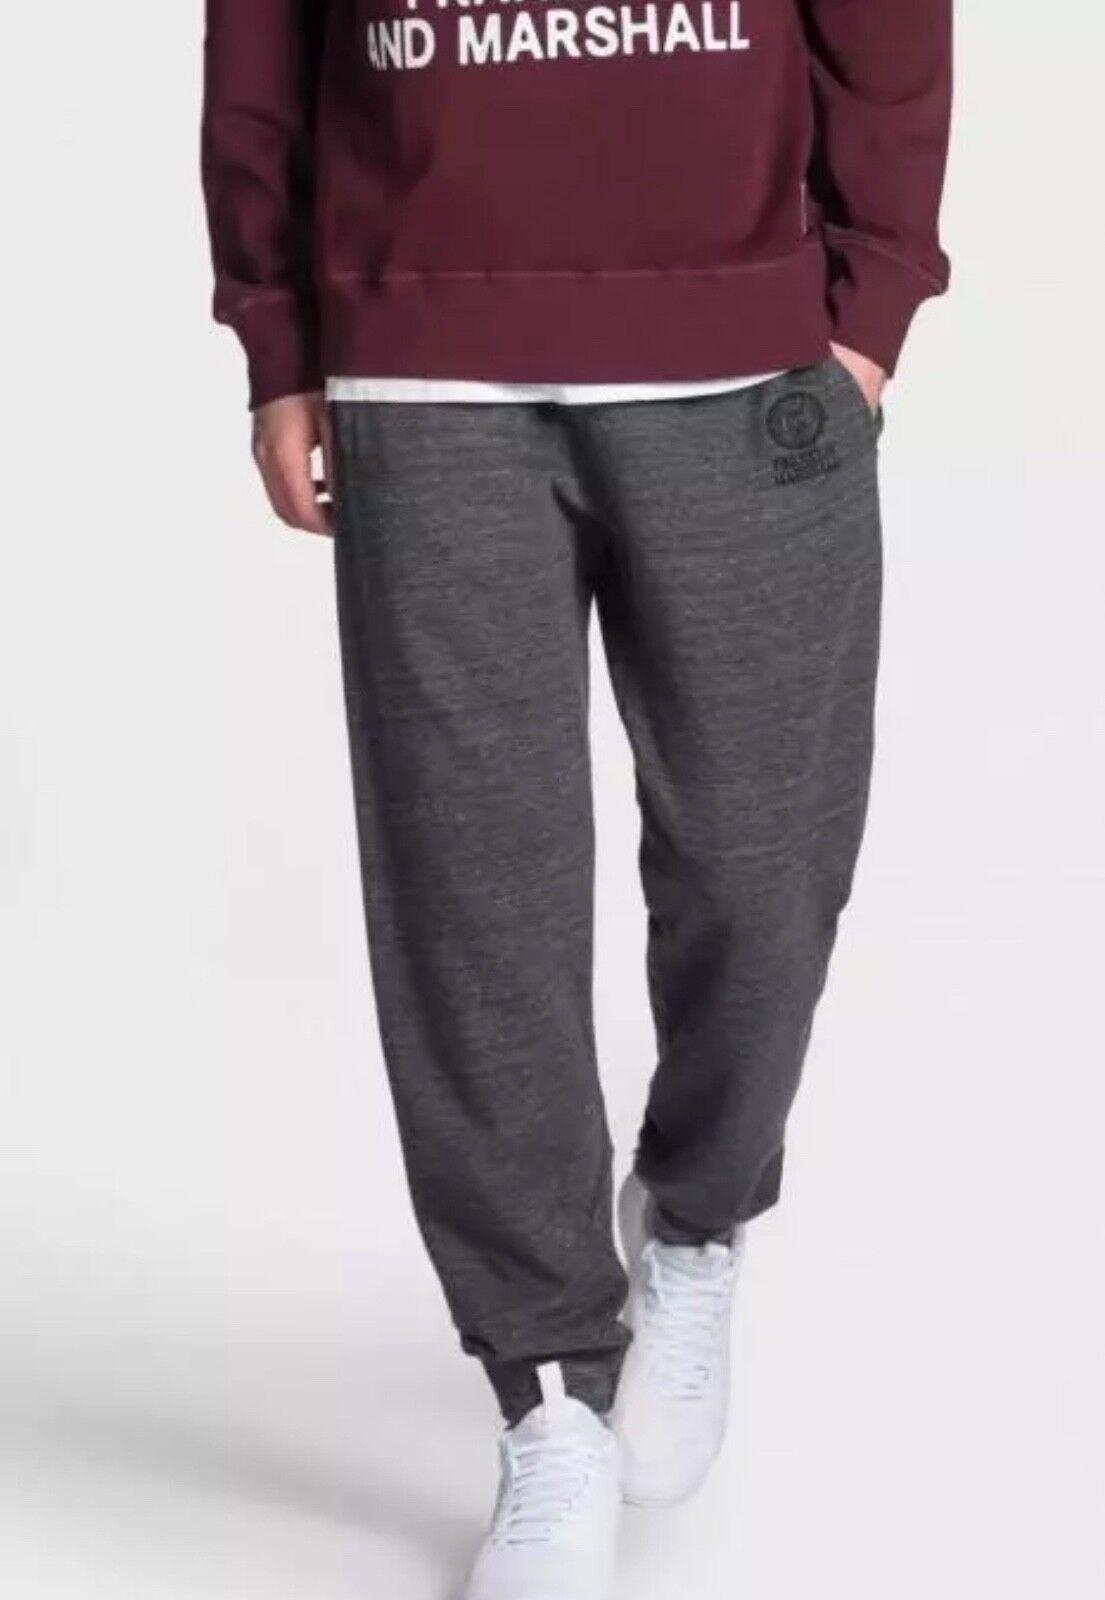 Franklin & Marshall Men's Jog Pants Grey XL